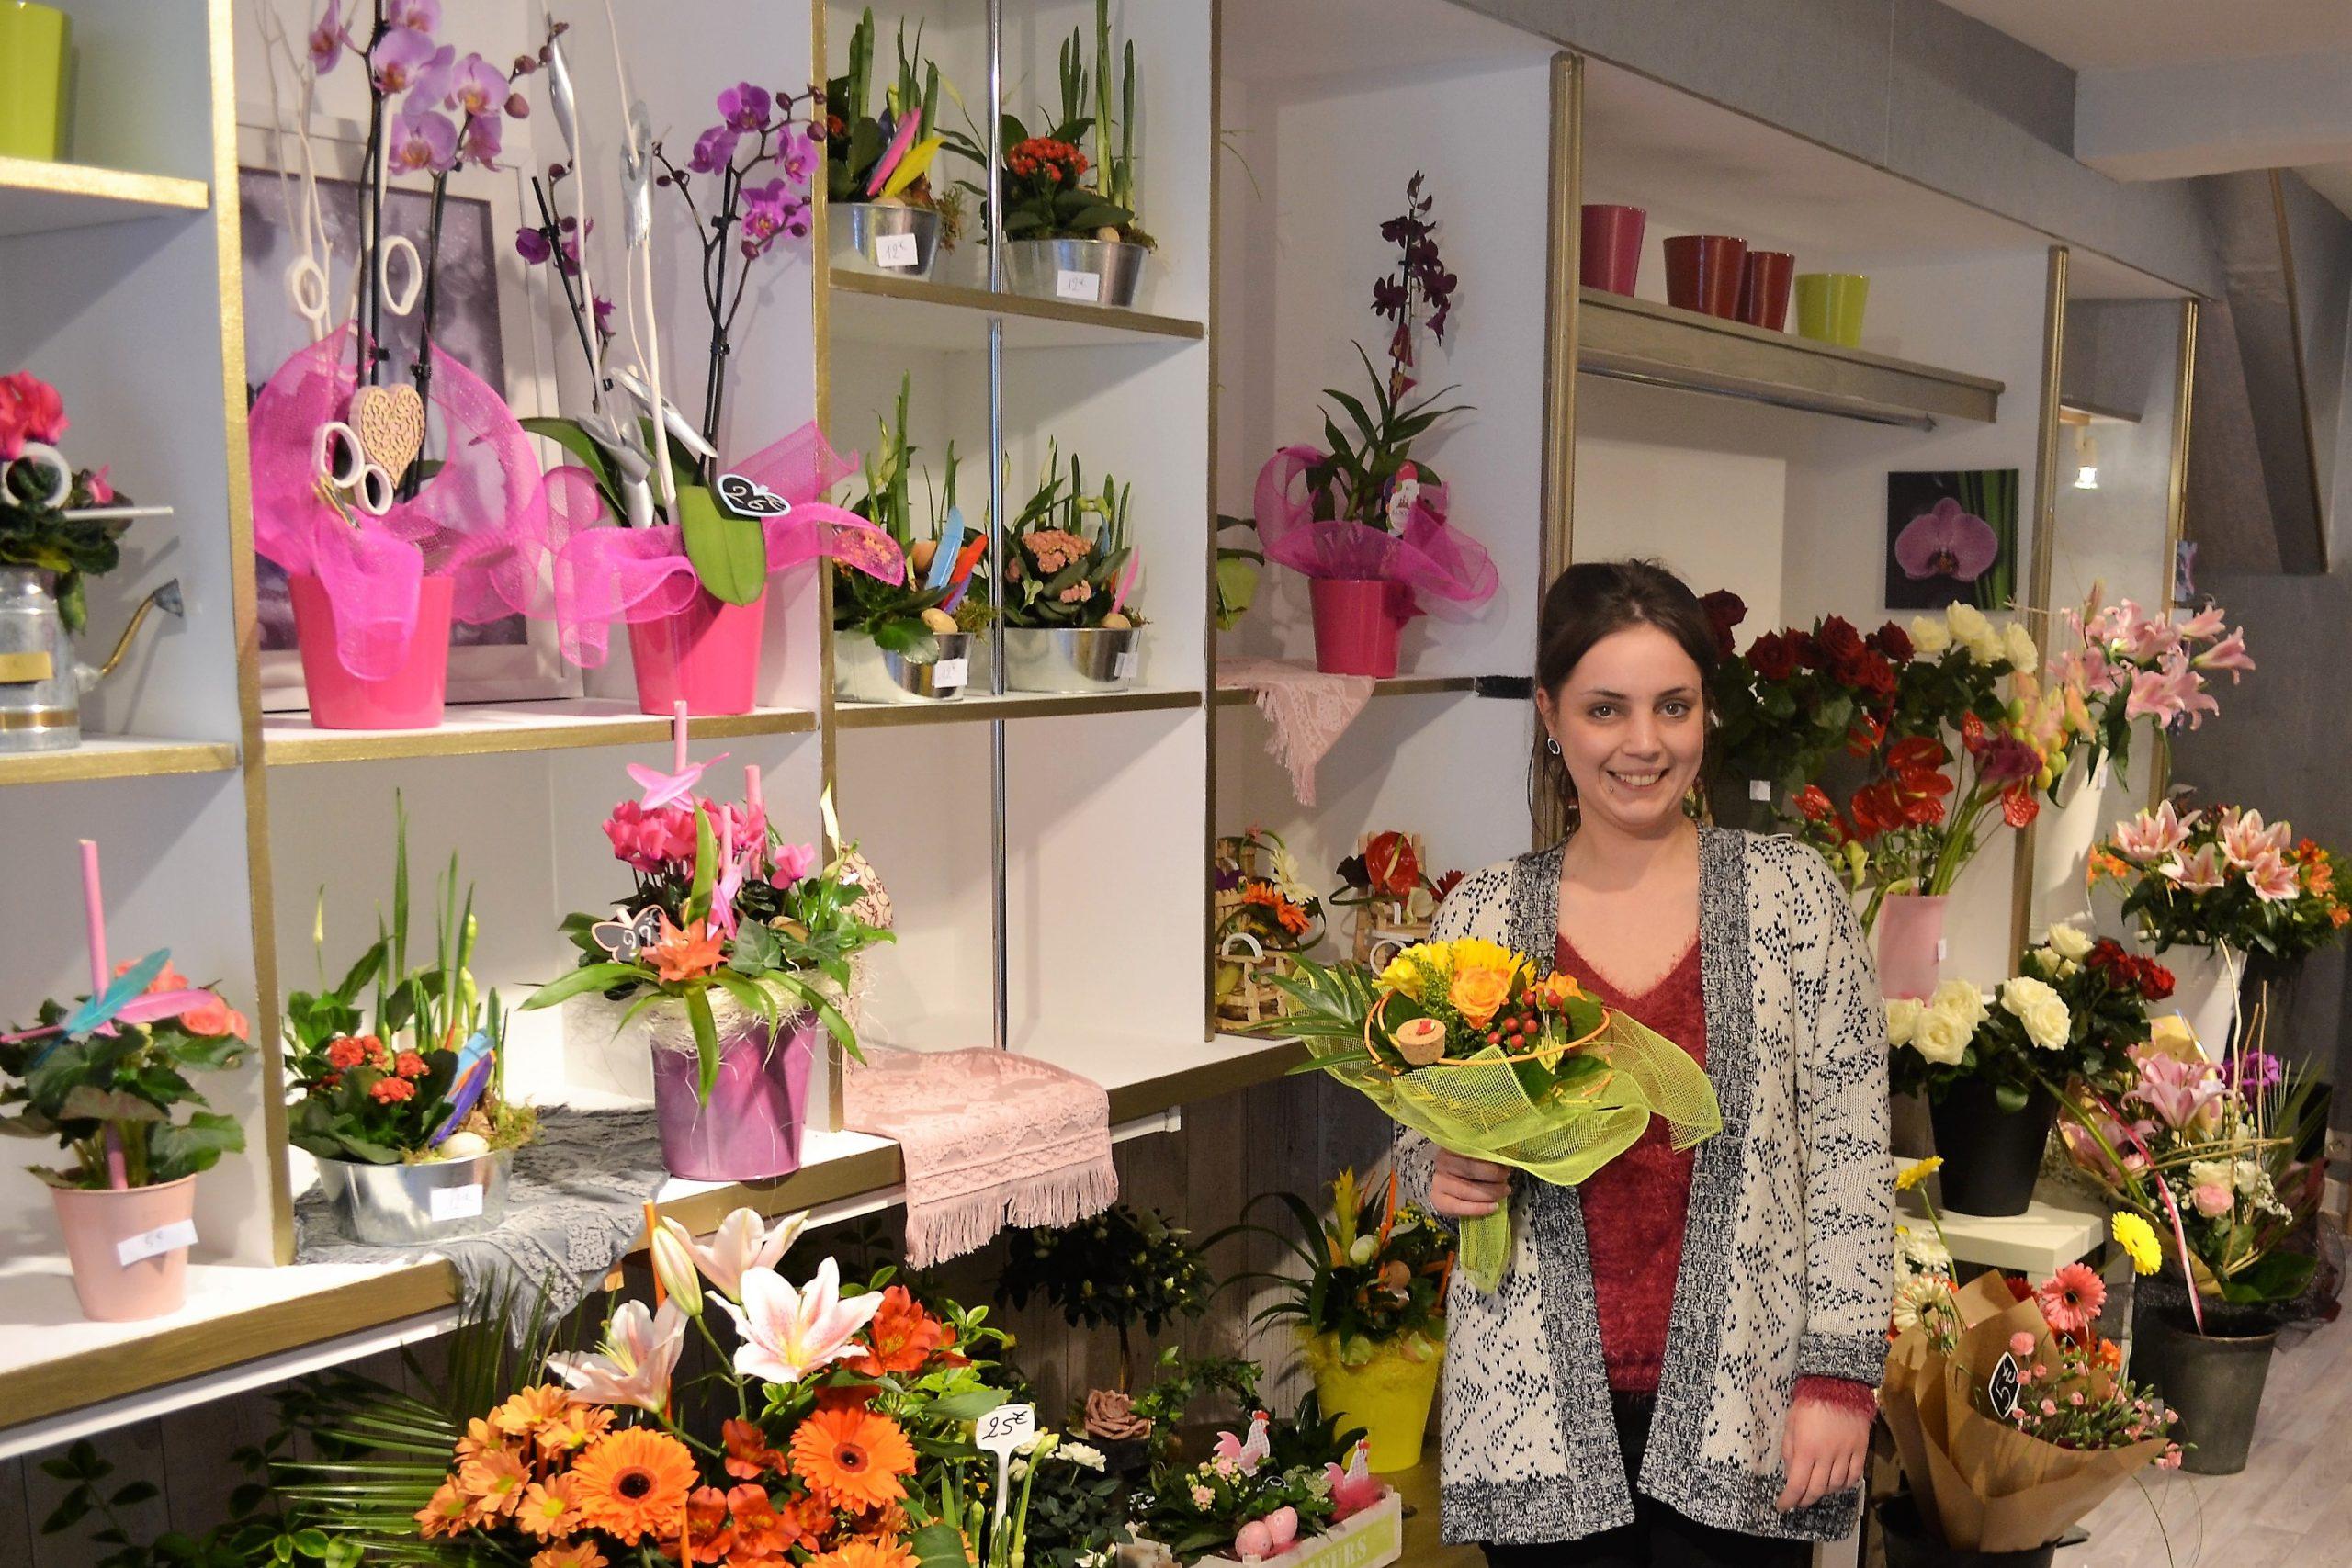 St-Pol : Gwendoline Mortier installe sa Bulle Fleurie rue d'Hesdin